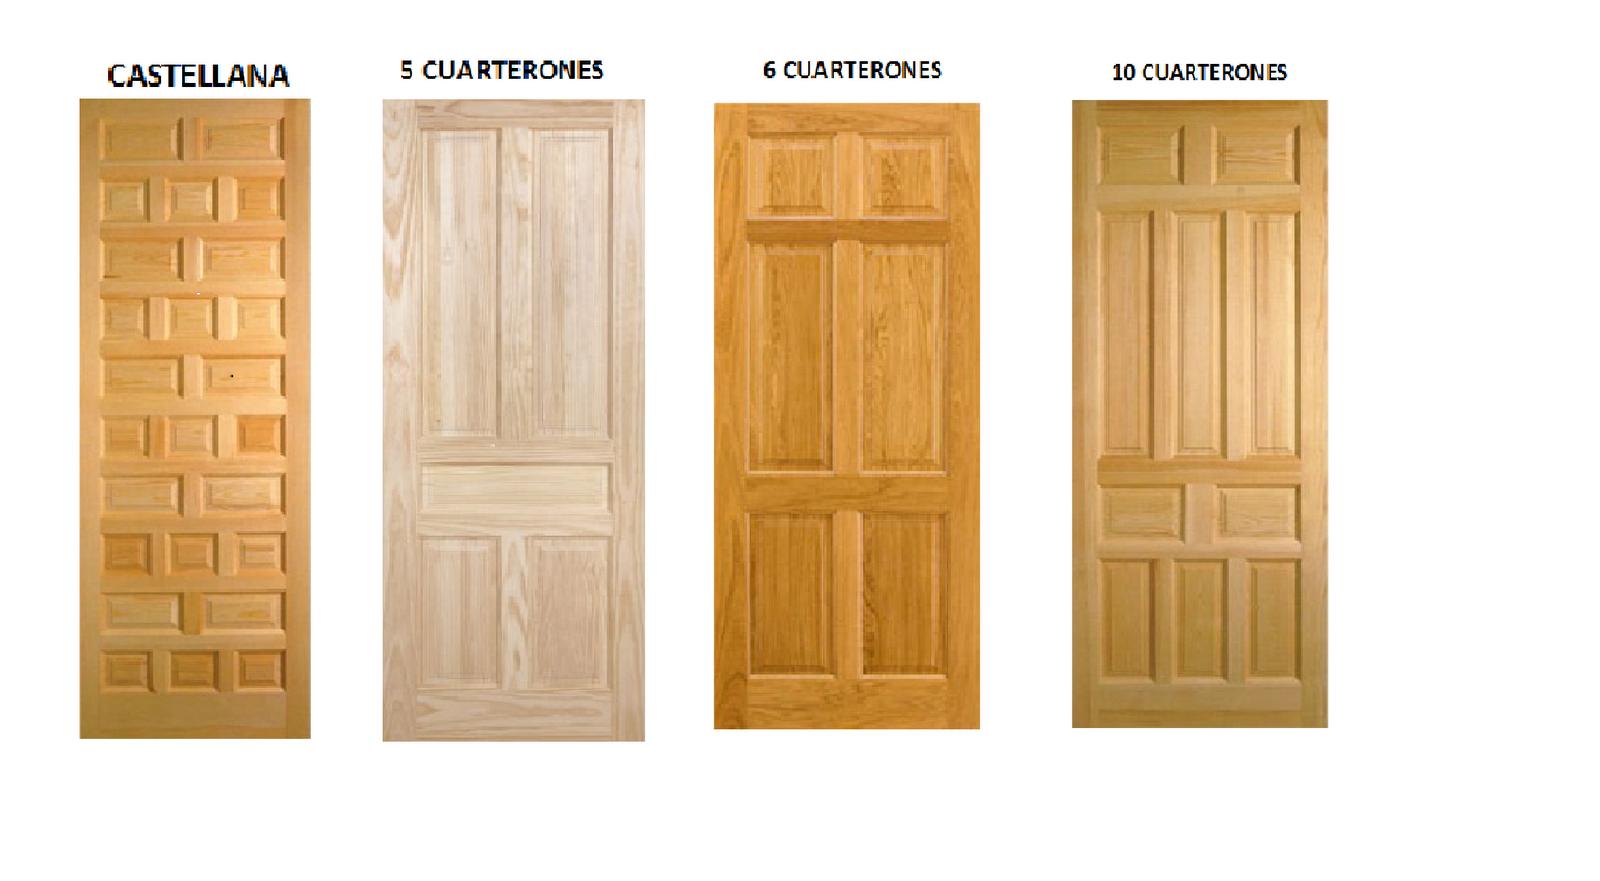 Puertas de exterior e interior puertas macizas en madera for Madera de puertas